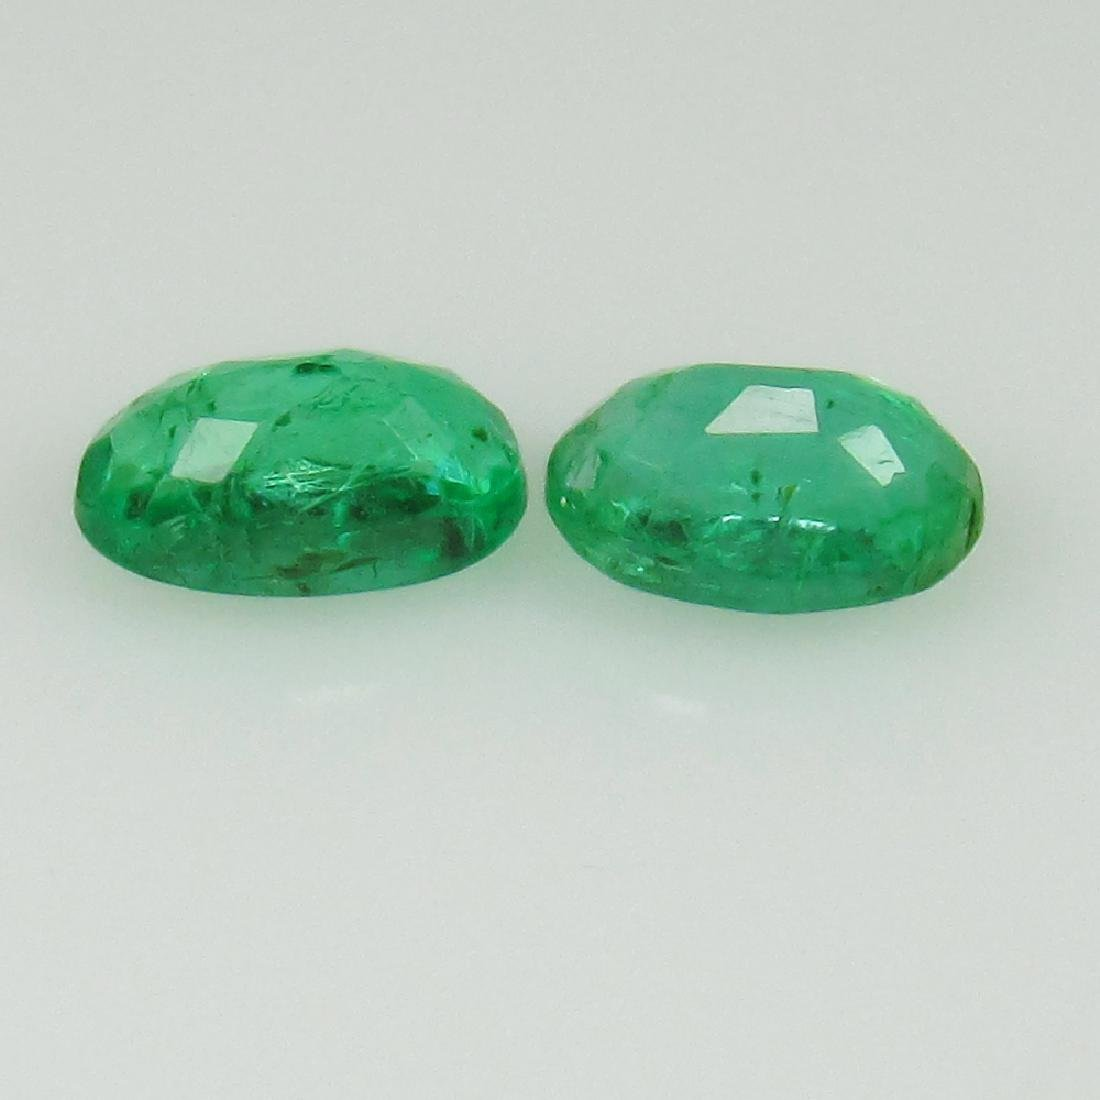 0.54 Ct Genuine Zambian Emerald Matching Oval Pair - 2